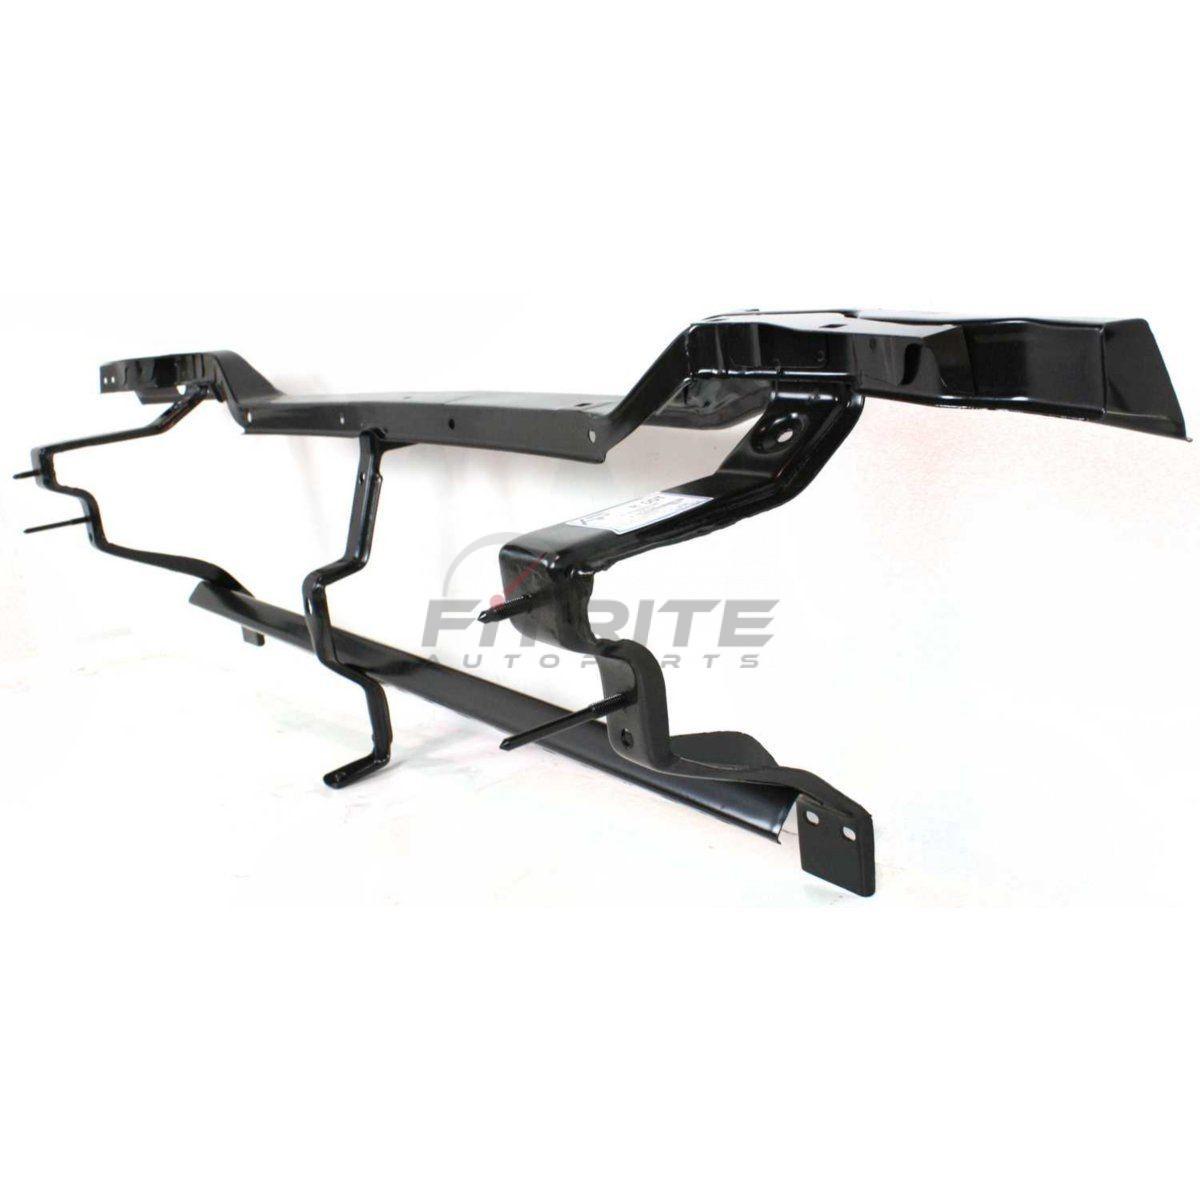 102-289 Choke Cable For 1989 Honda TRX300 FourTrax ATV~Sports Parts Inc